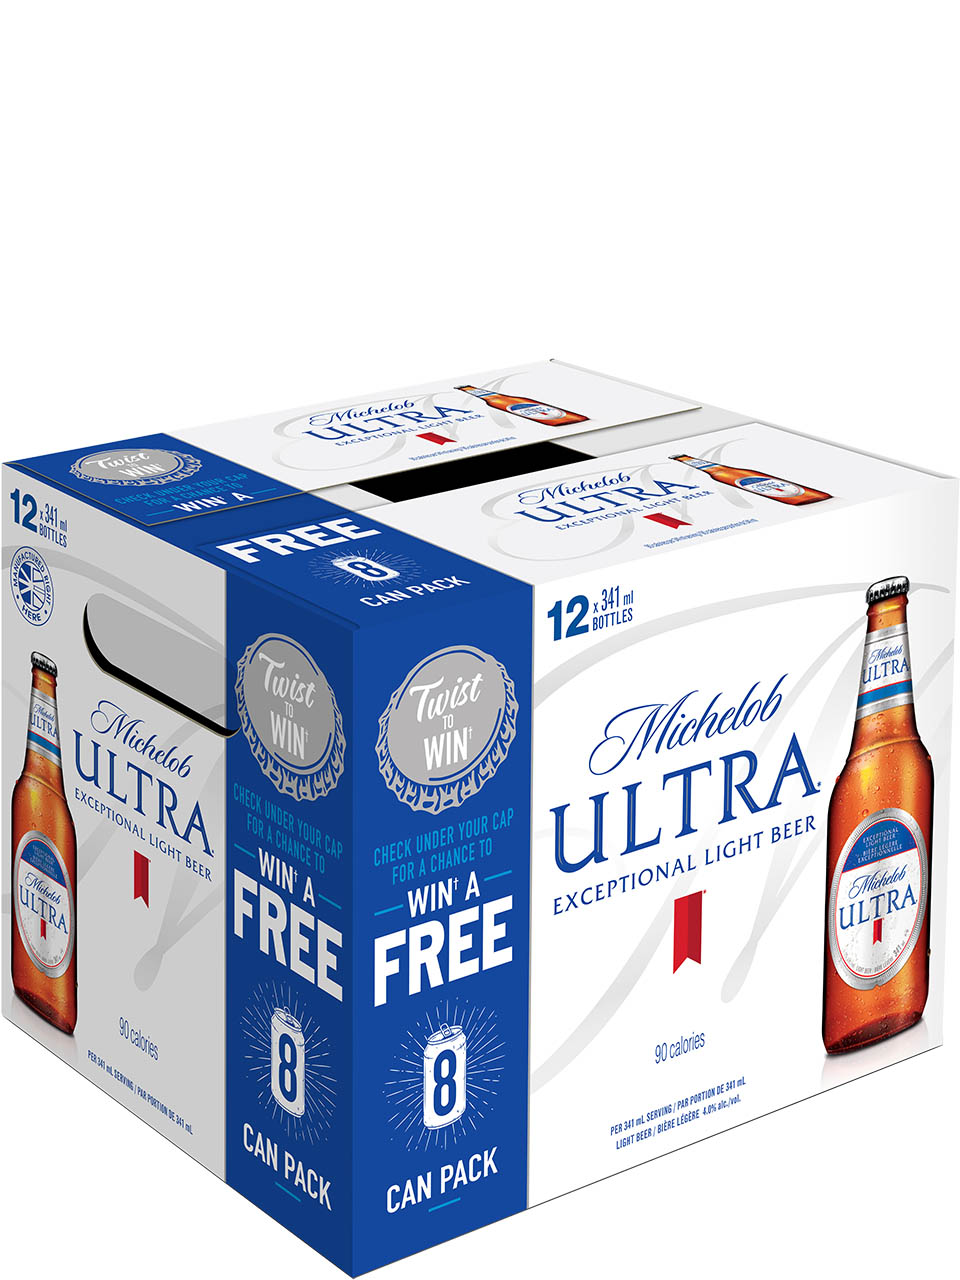 Michelob Ultra 12 Pack Bottles